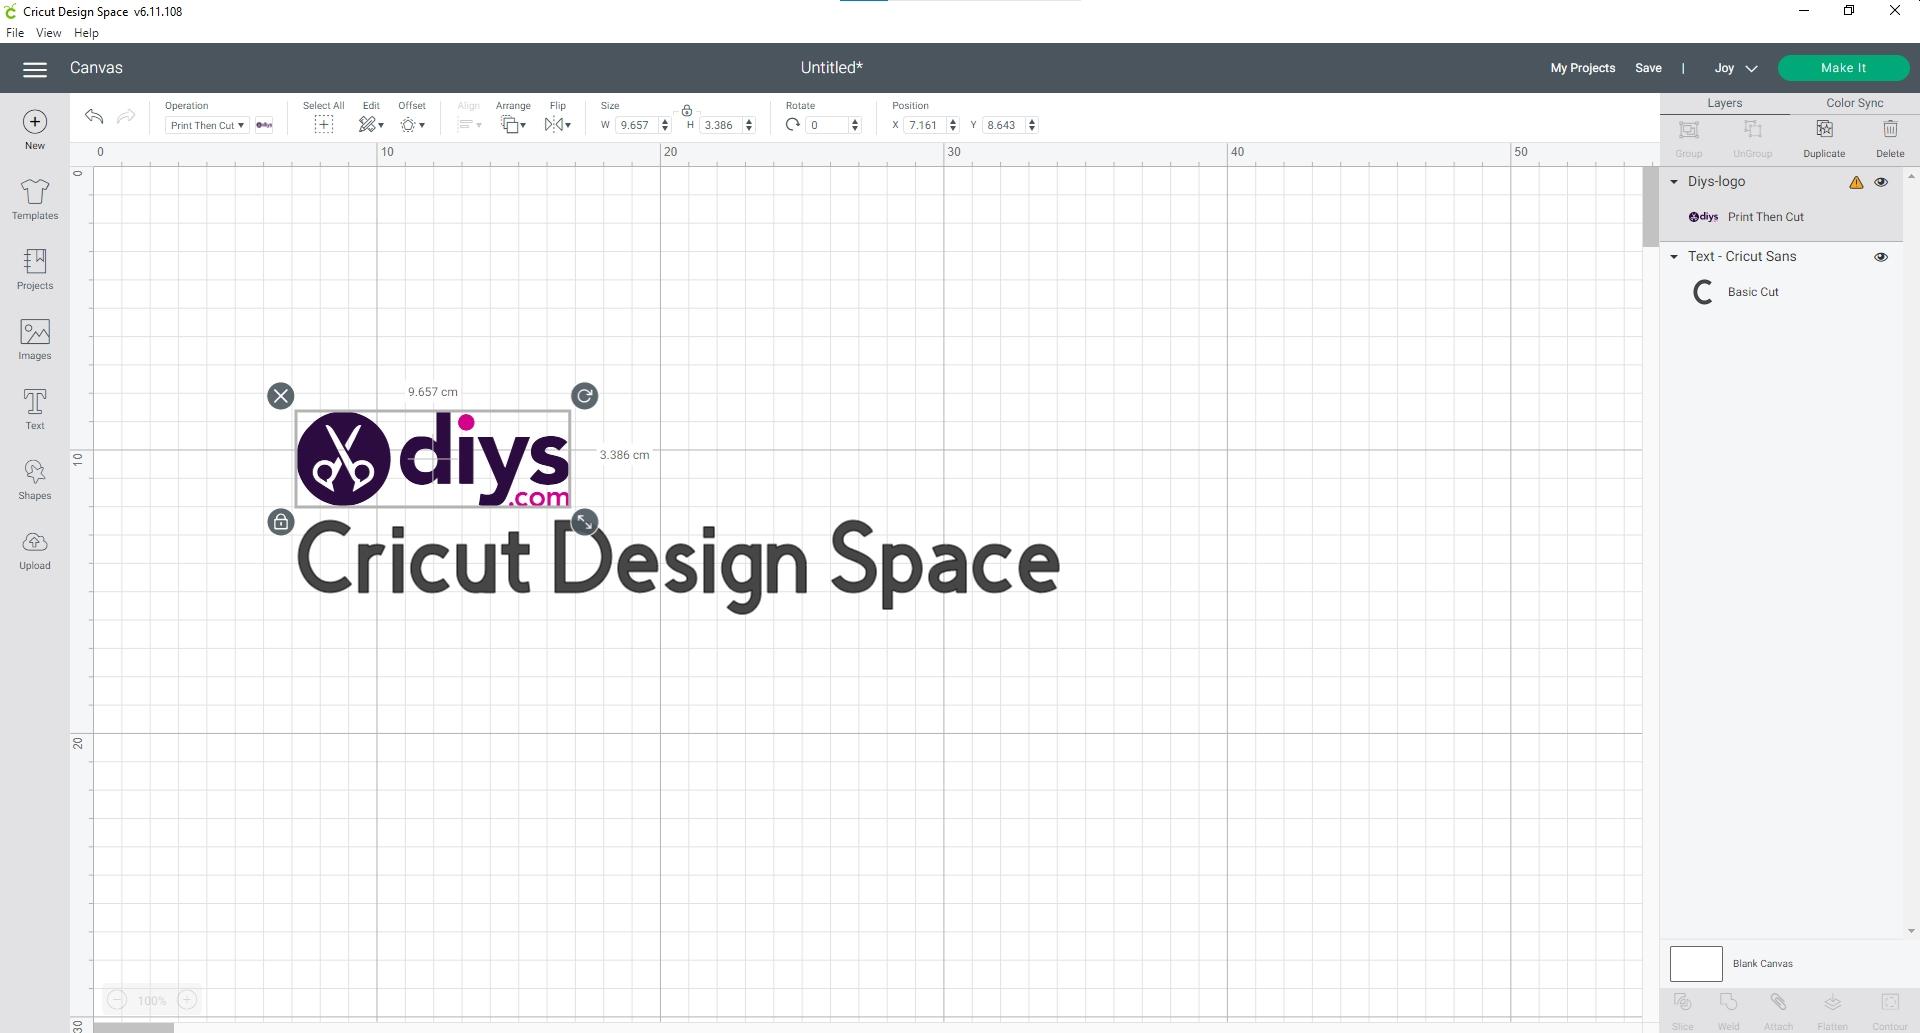 Cricut design software